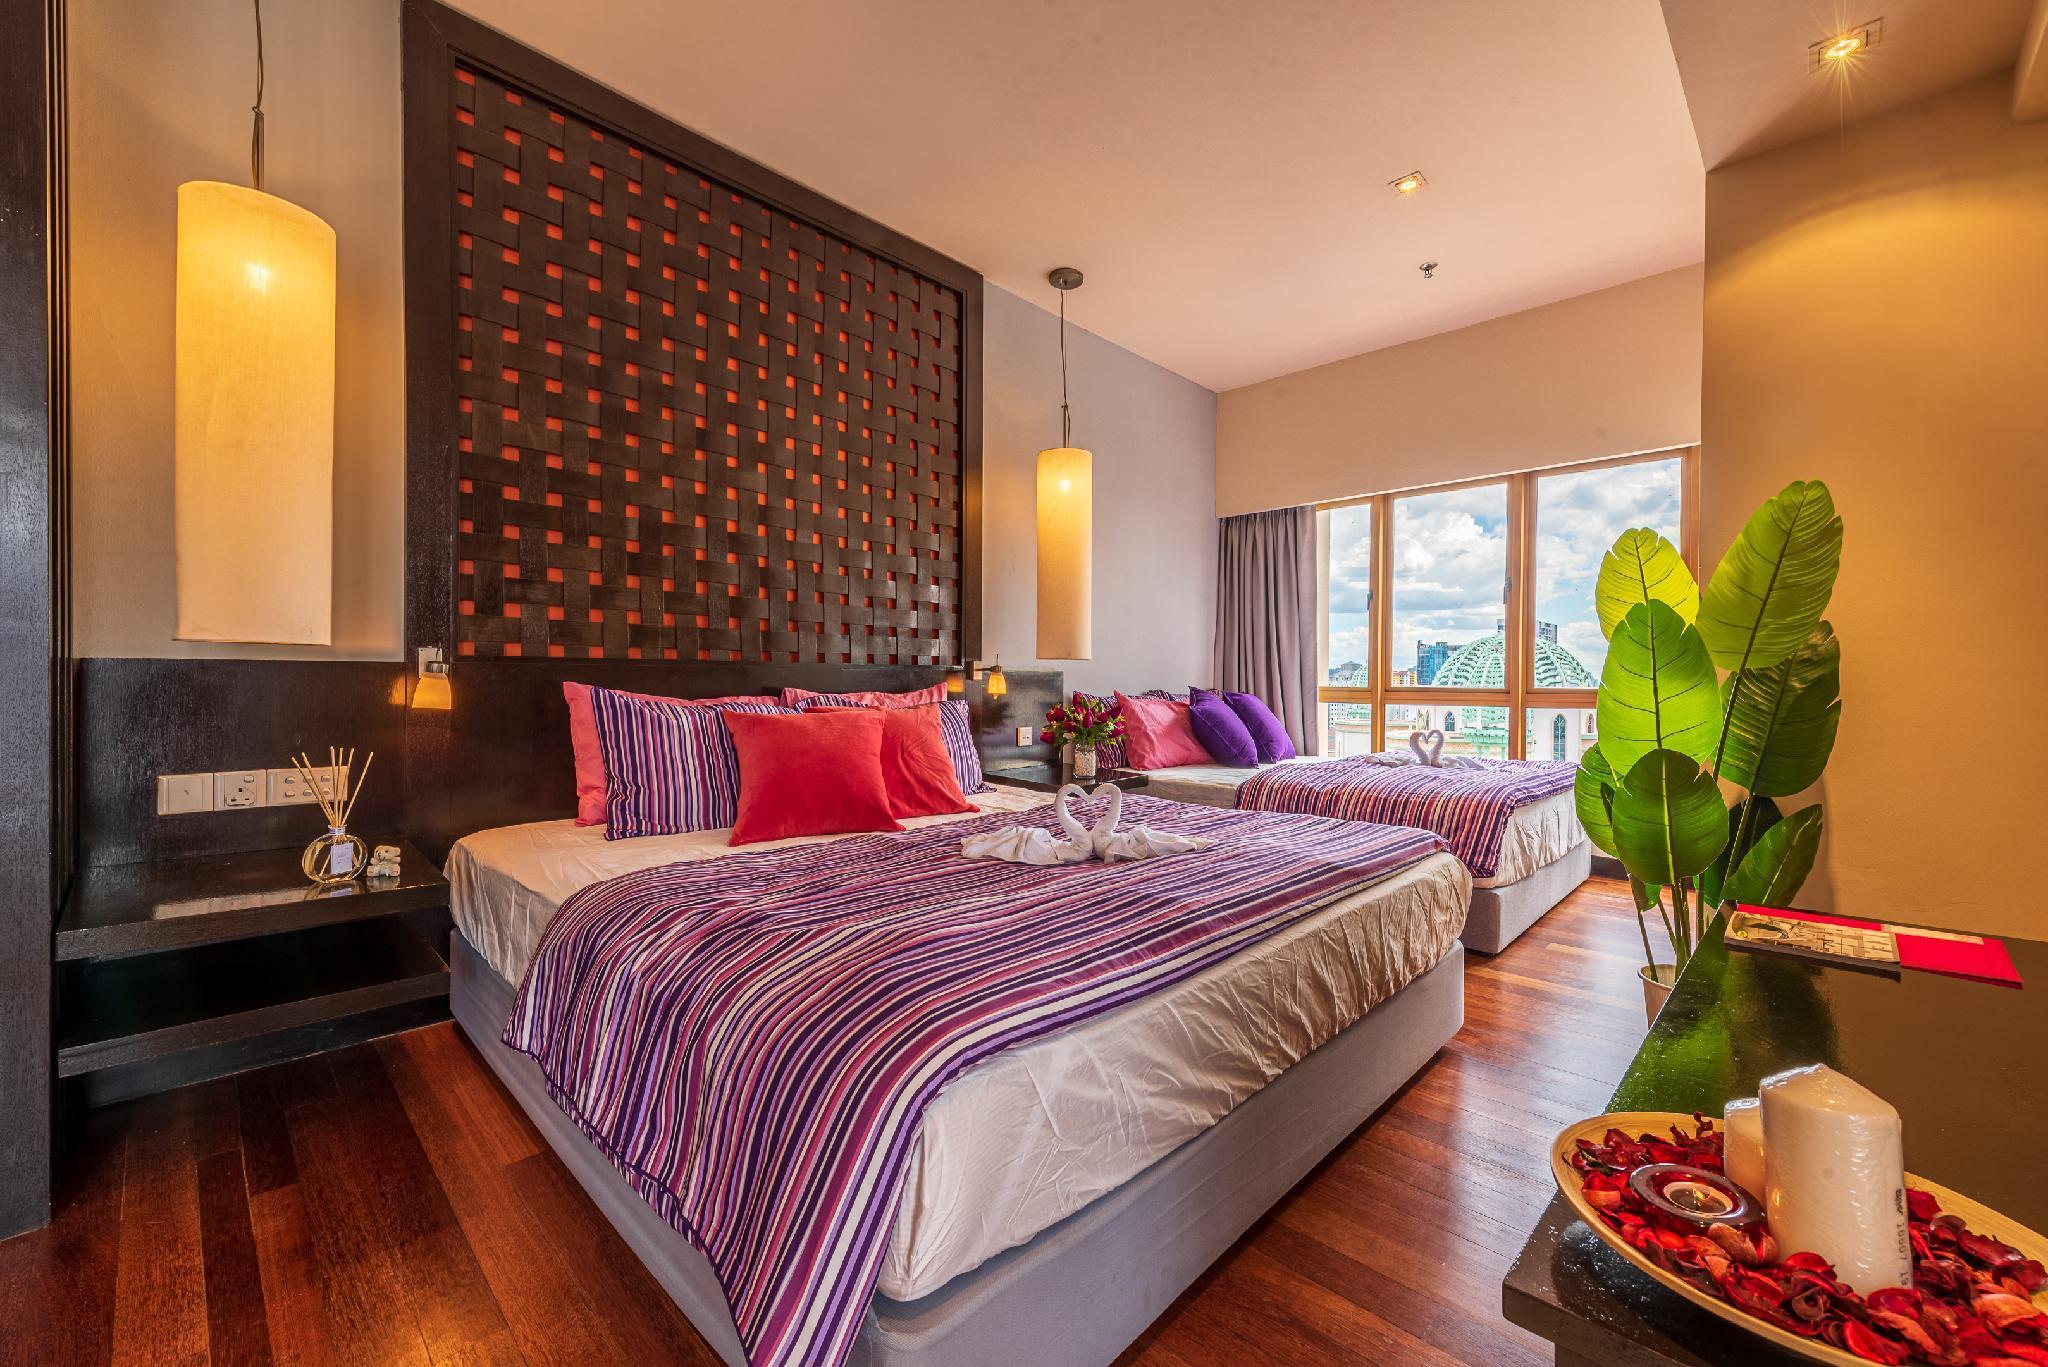 Sunway Resort Suite 7pax@Sunway Lagoon Pyramid